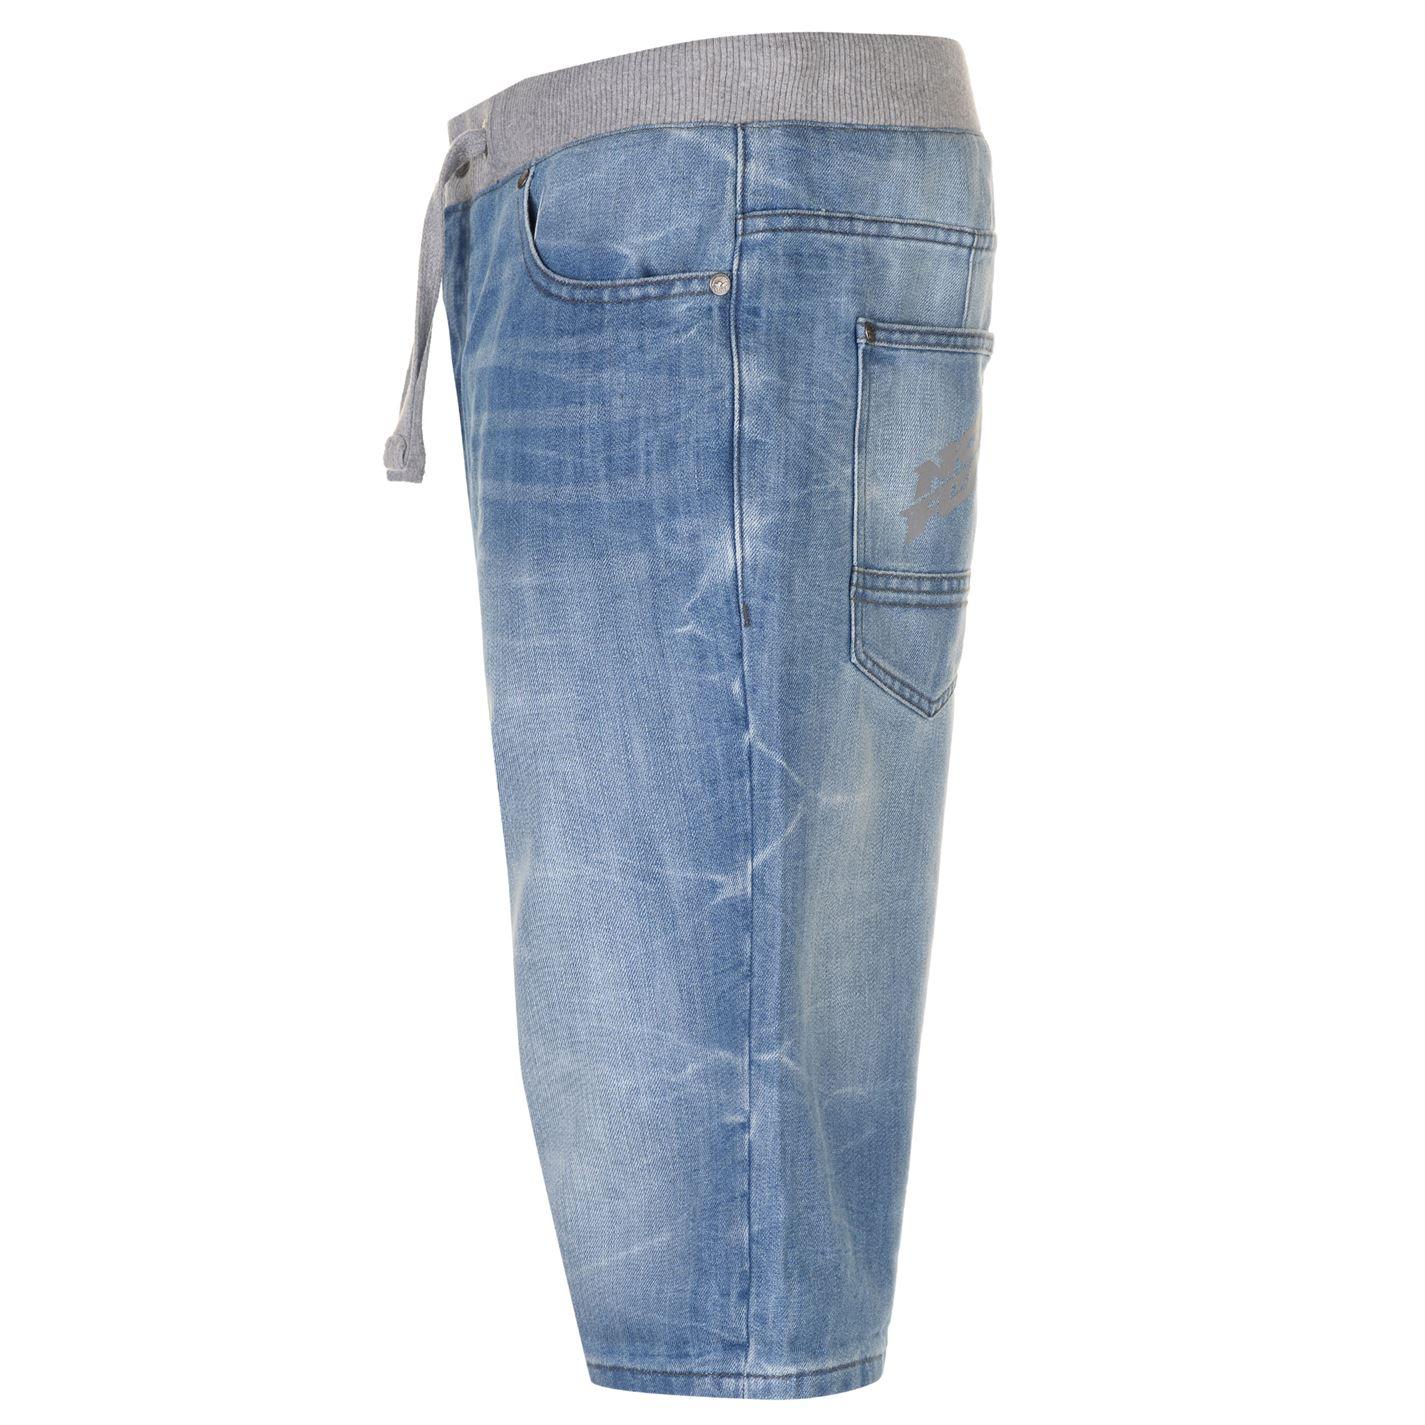 No-Fear-Mens-Denim-Shorts-Pants-Trousers-Bottoms-Zip-Warm-Drawstring-Elasticated thumbnail 8